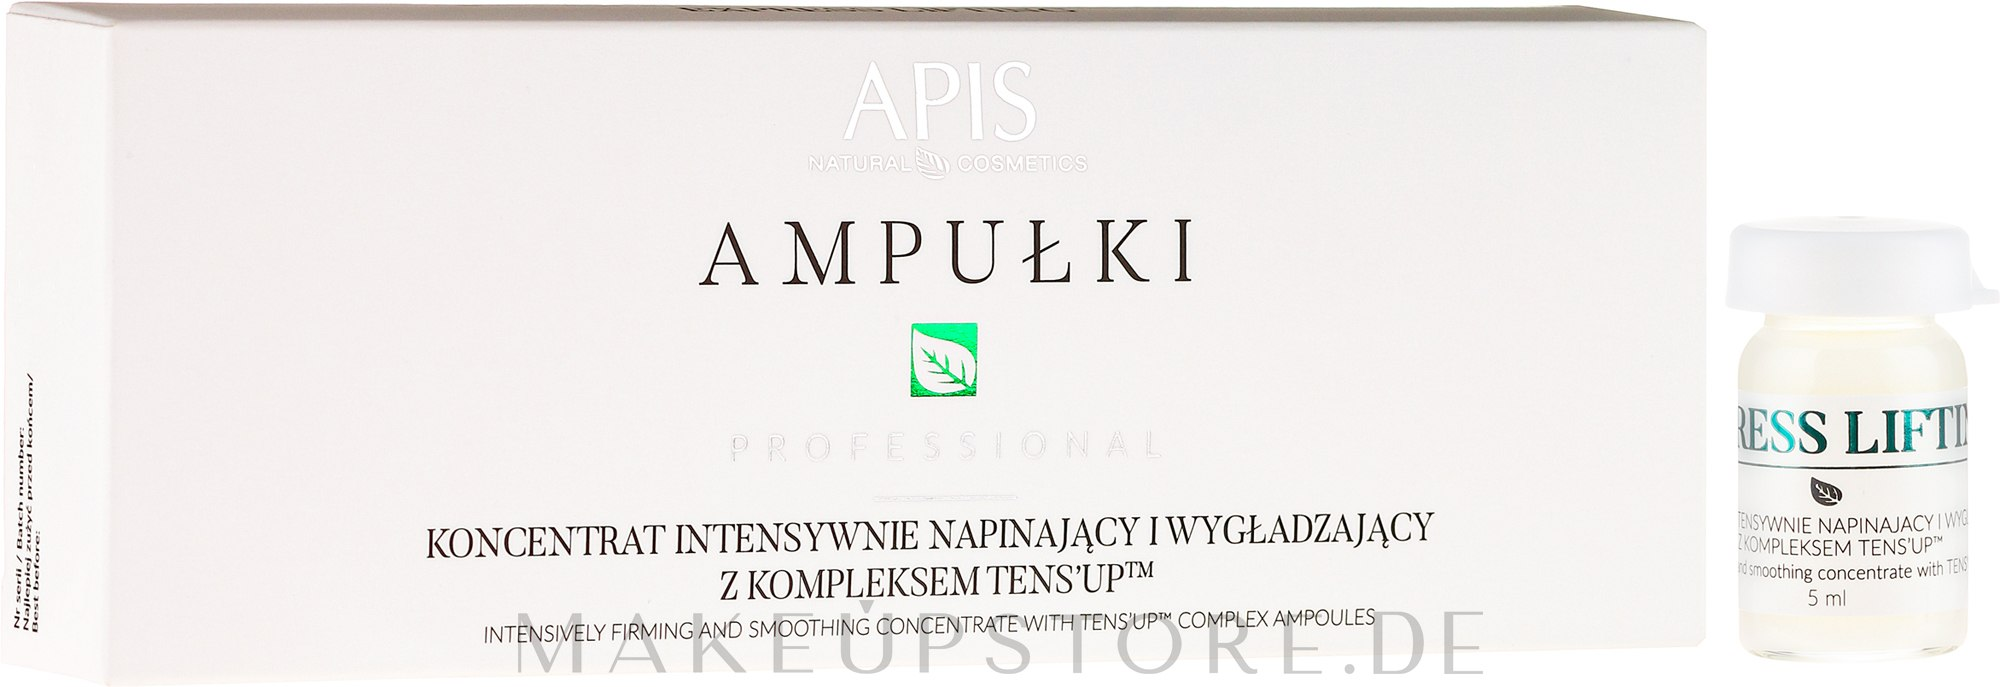 Gesichtskonzentrat mit Lifting-Effekt - APIS Professional Concentrate Ampule Ten's Up — Bild 5 x 5 ml